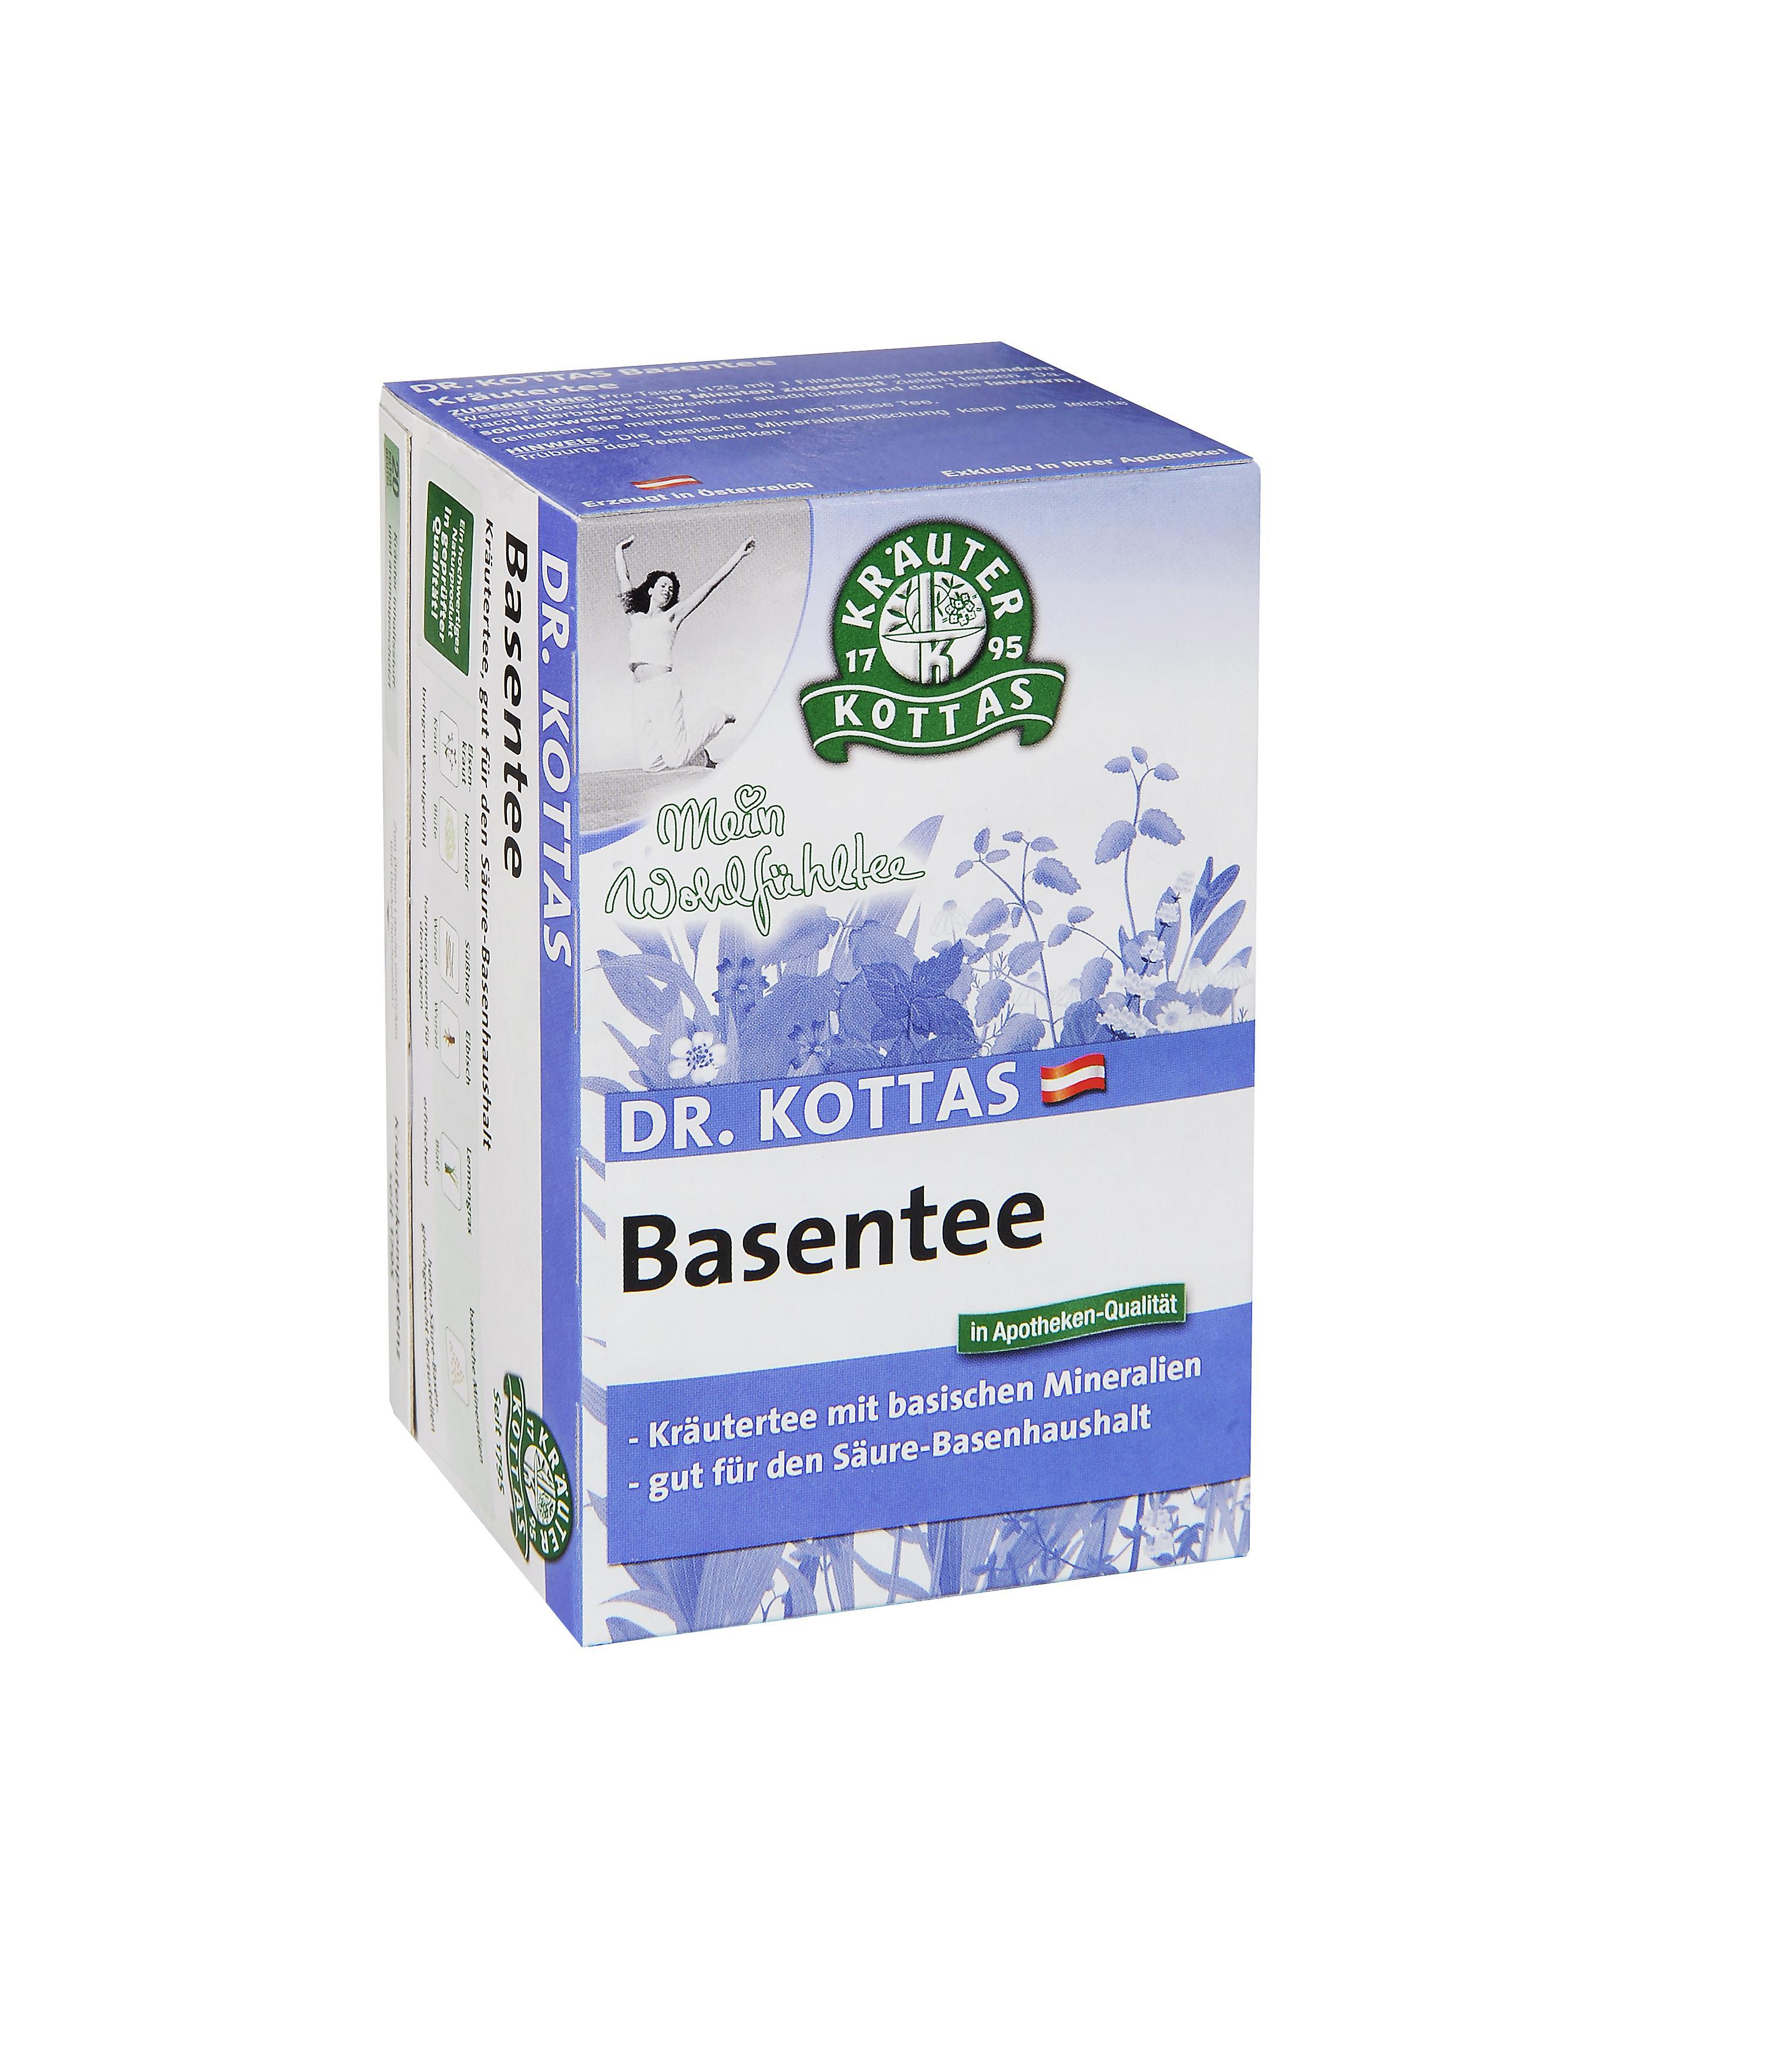 Dr. Kottas Basentee